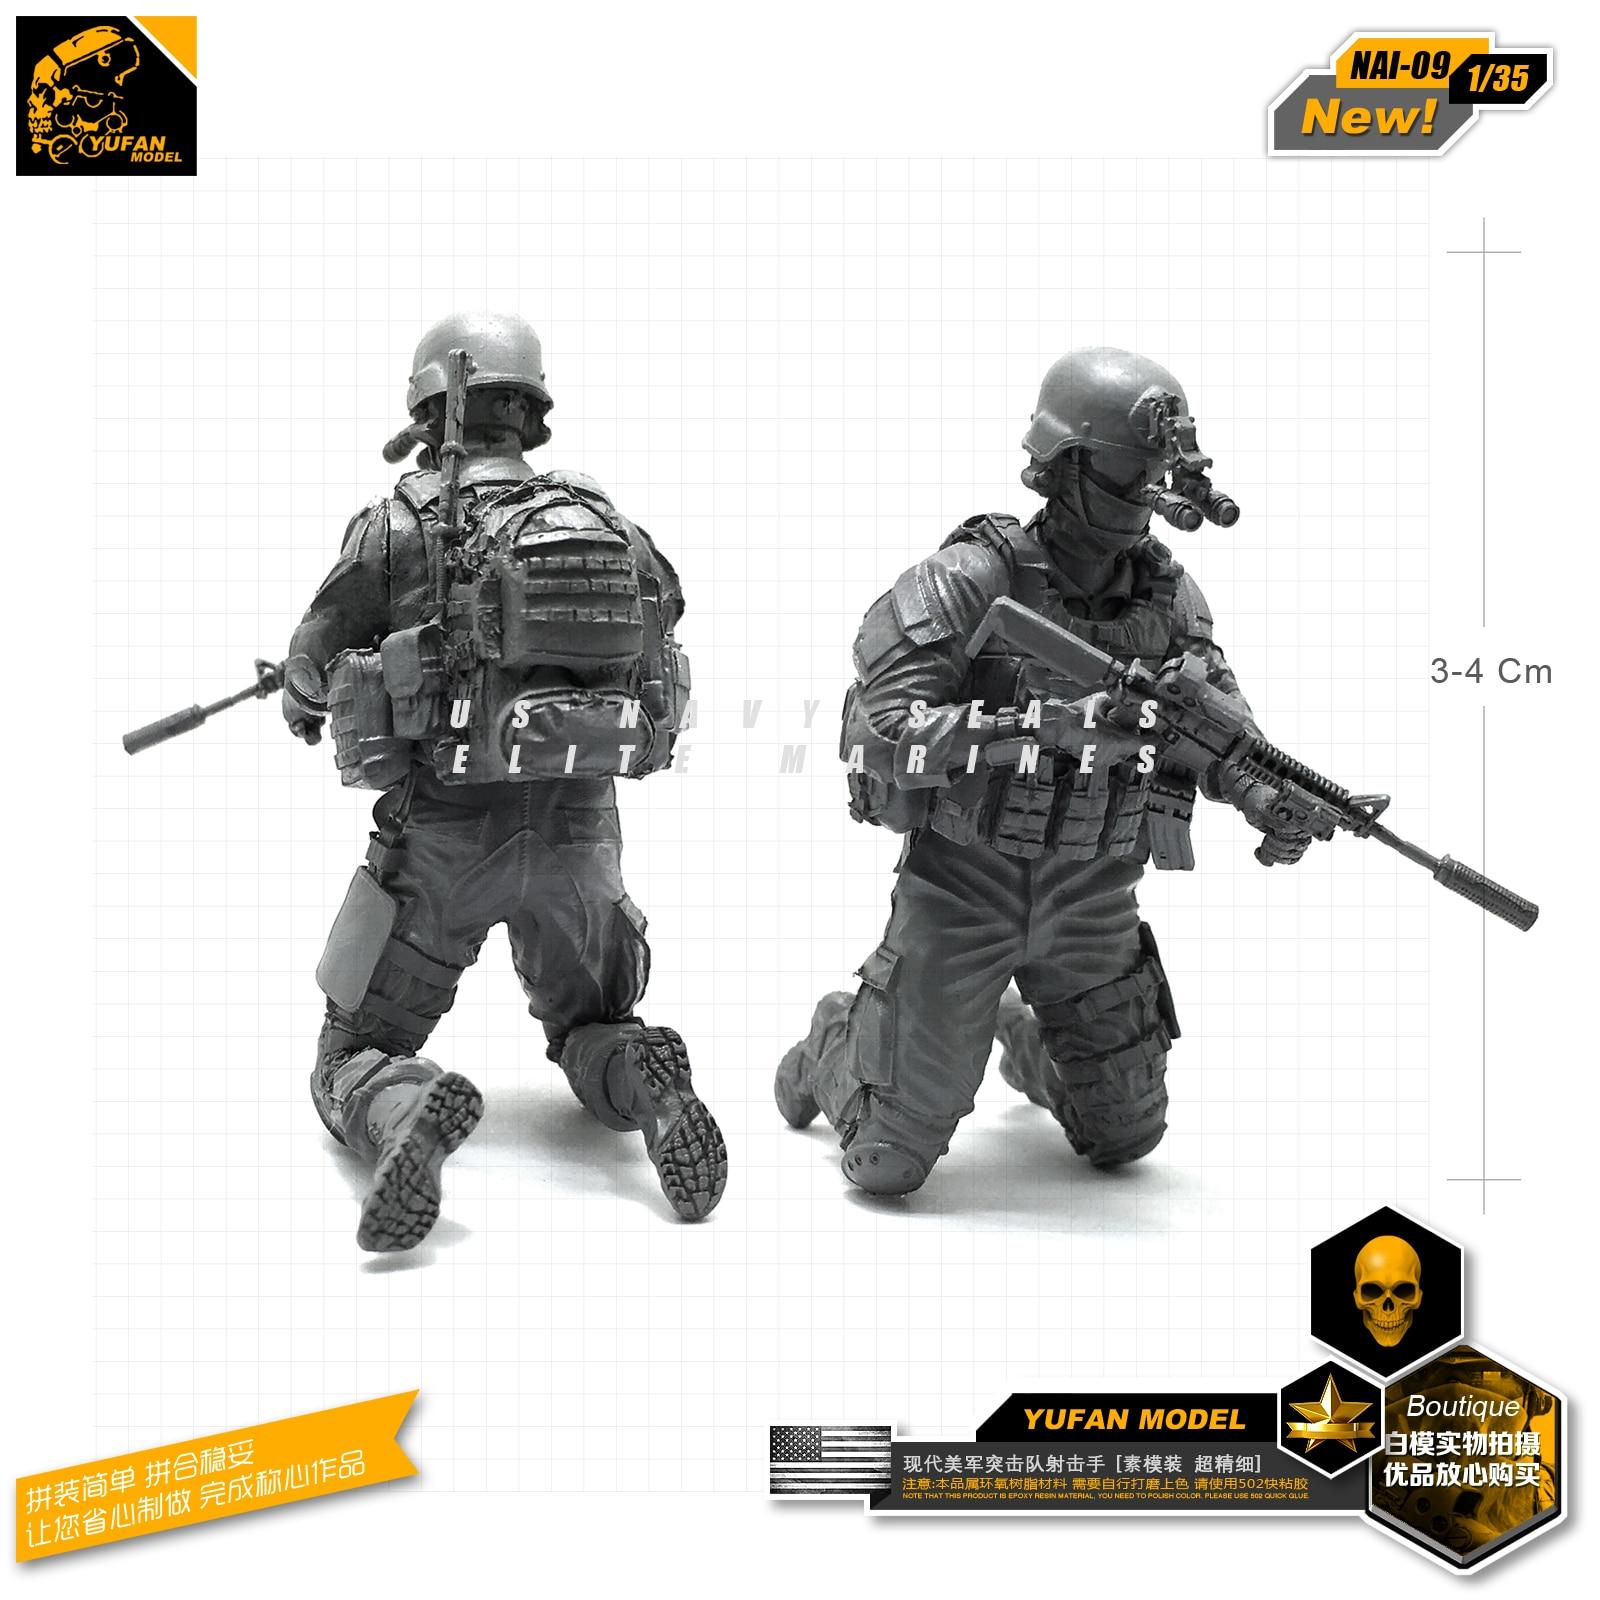 Yufan Model 1/35 Figure Model Accessories Kits Us Seal Sniper 2 Resin Soldier Model  Unmounted Nai-09